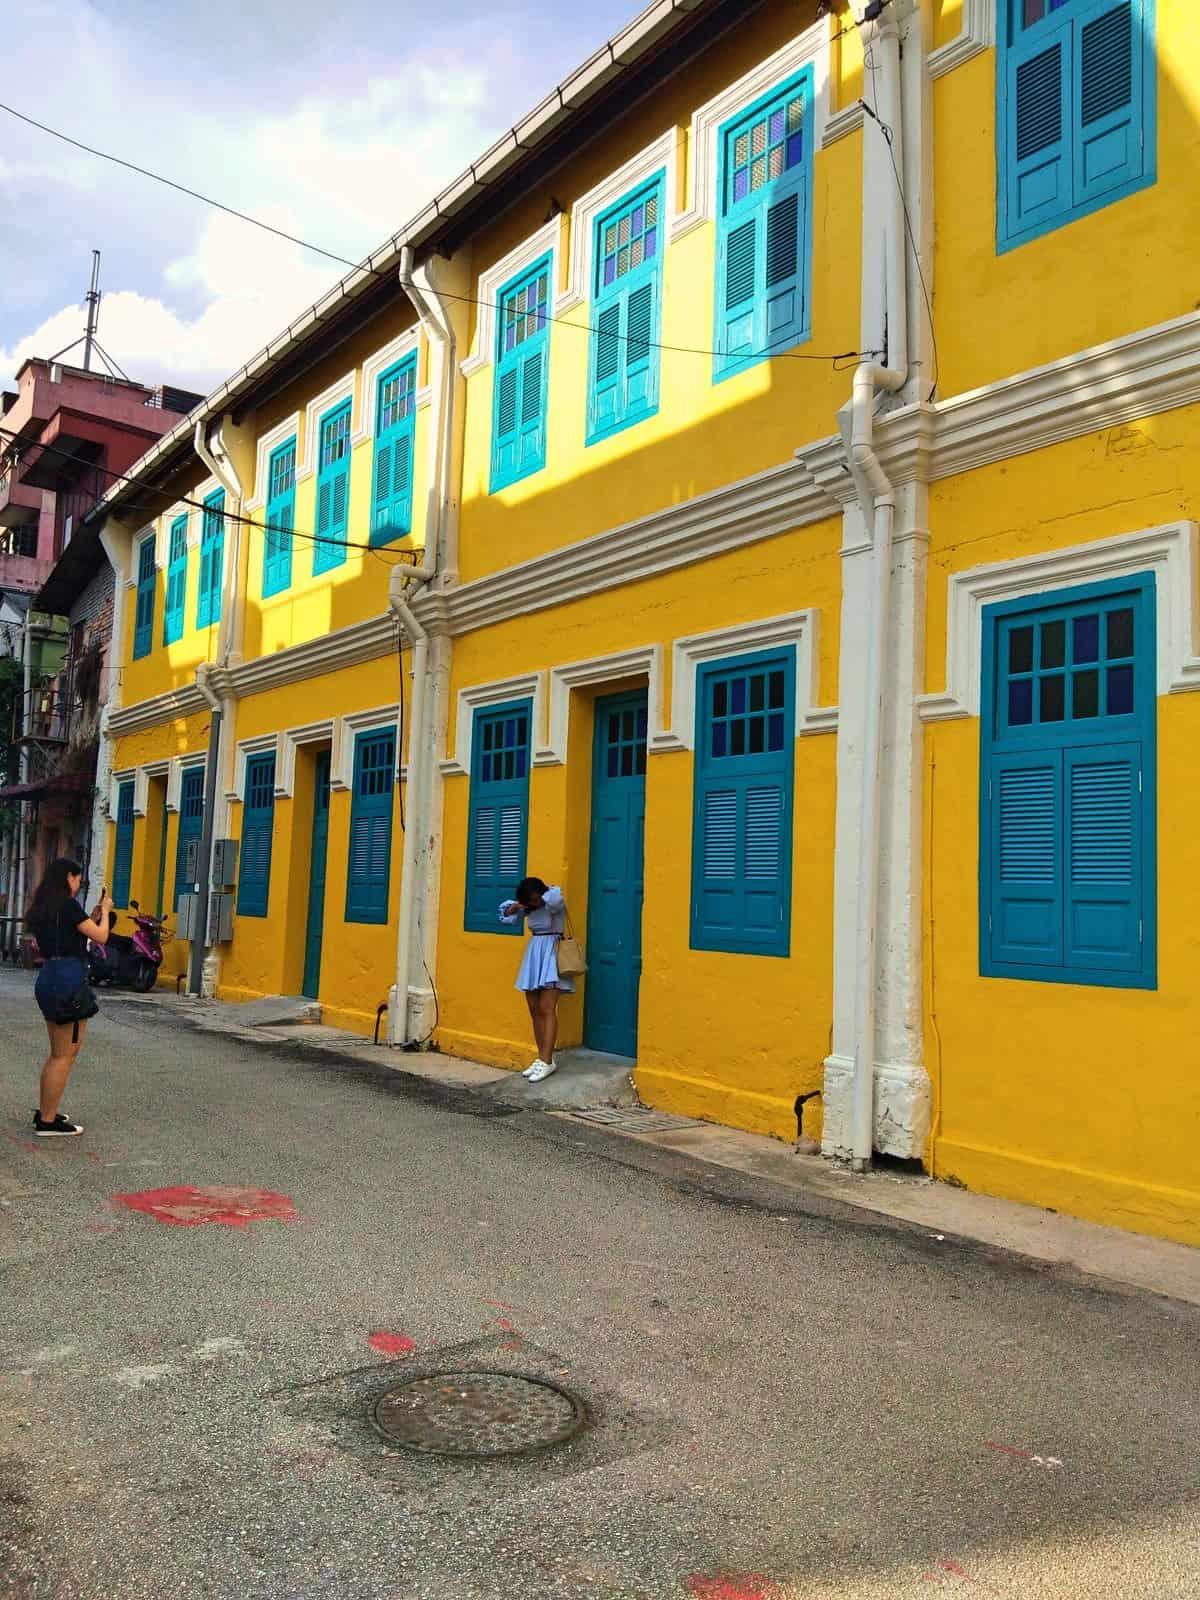 Yellow Chinese Shophouses in Chinatown, Kuala Lumpur